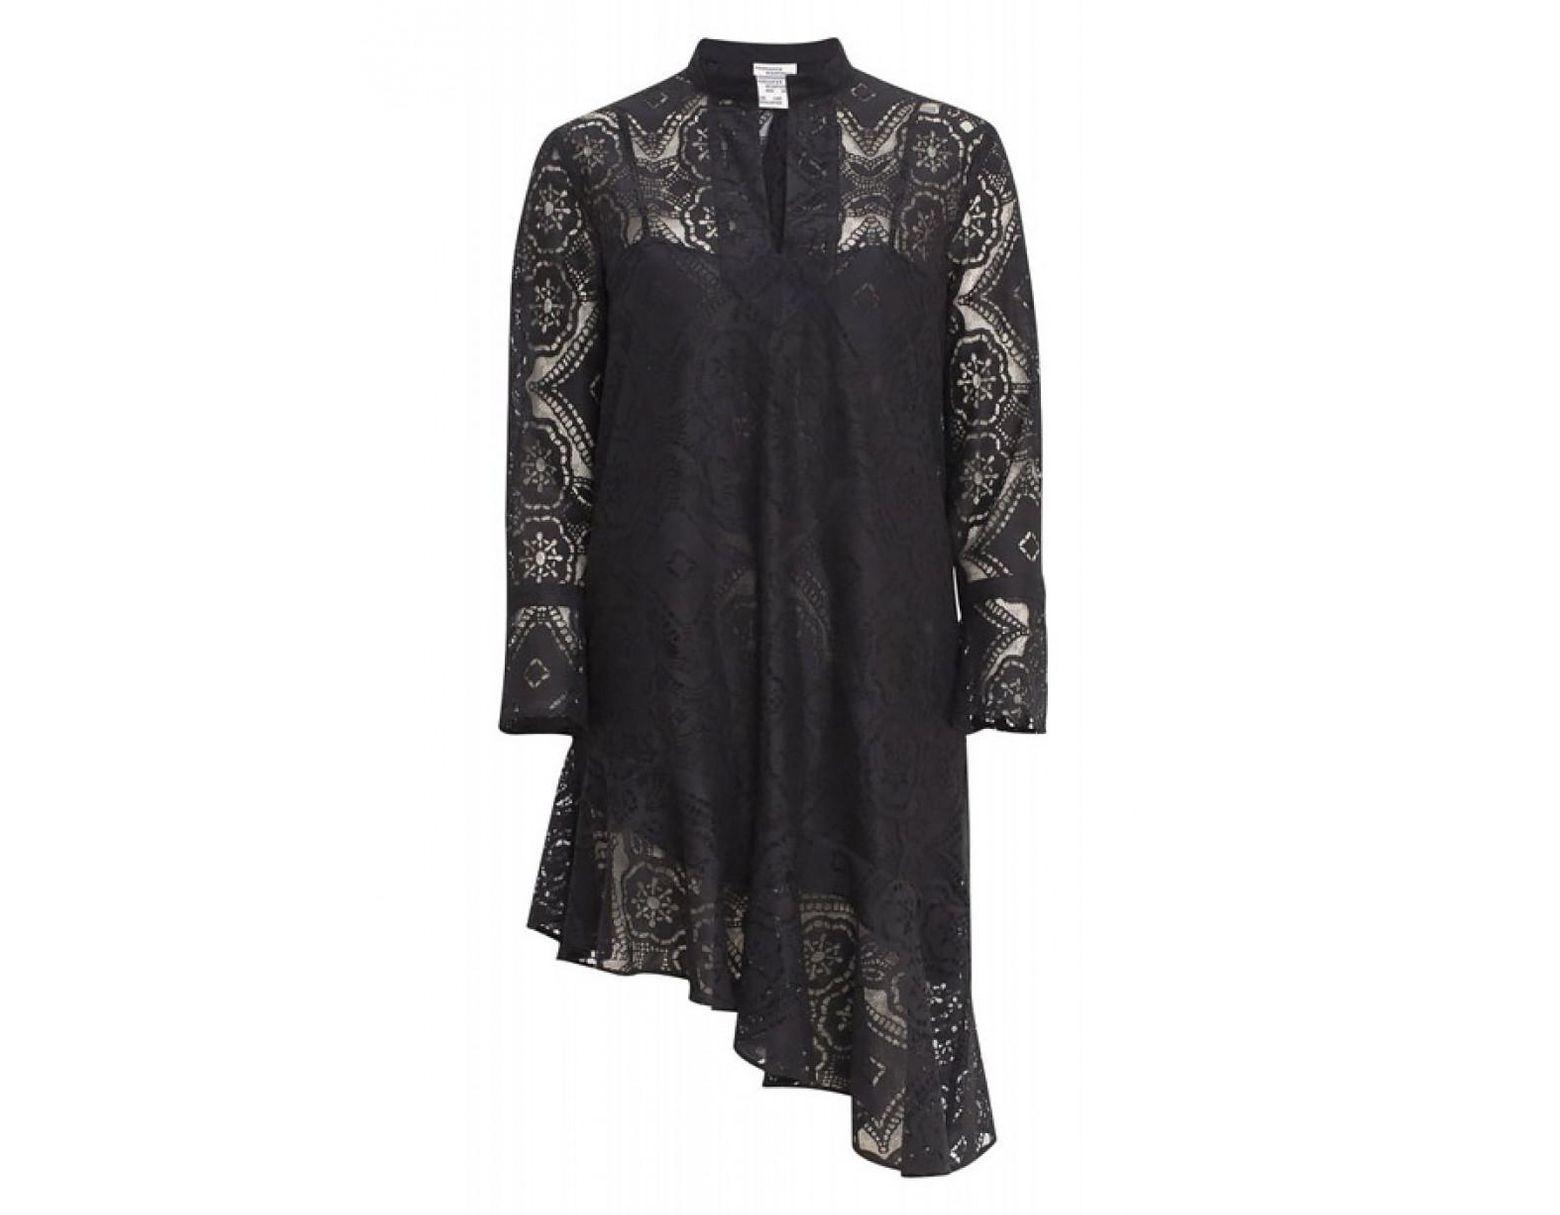 133b0b601da Baum und Pferdgarten Alicia Black Lace Dress in Black - Lyst